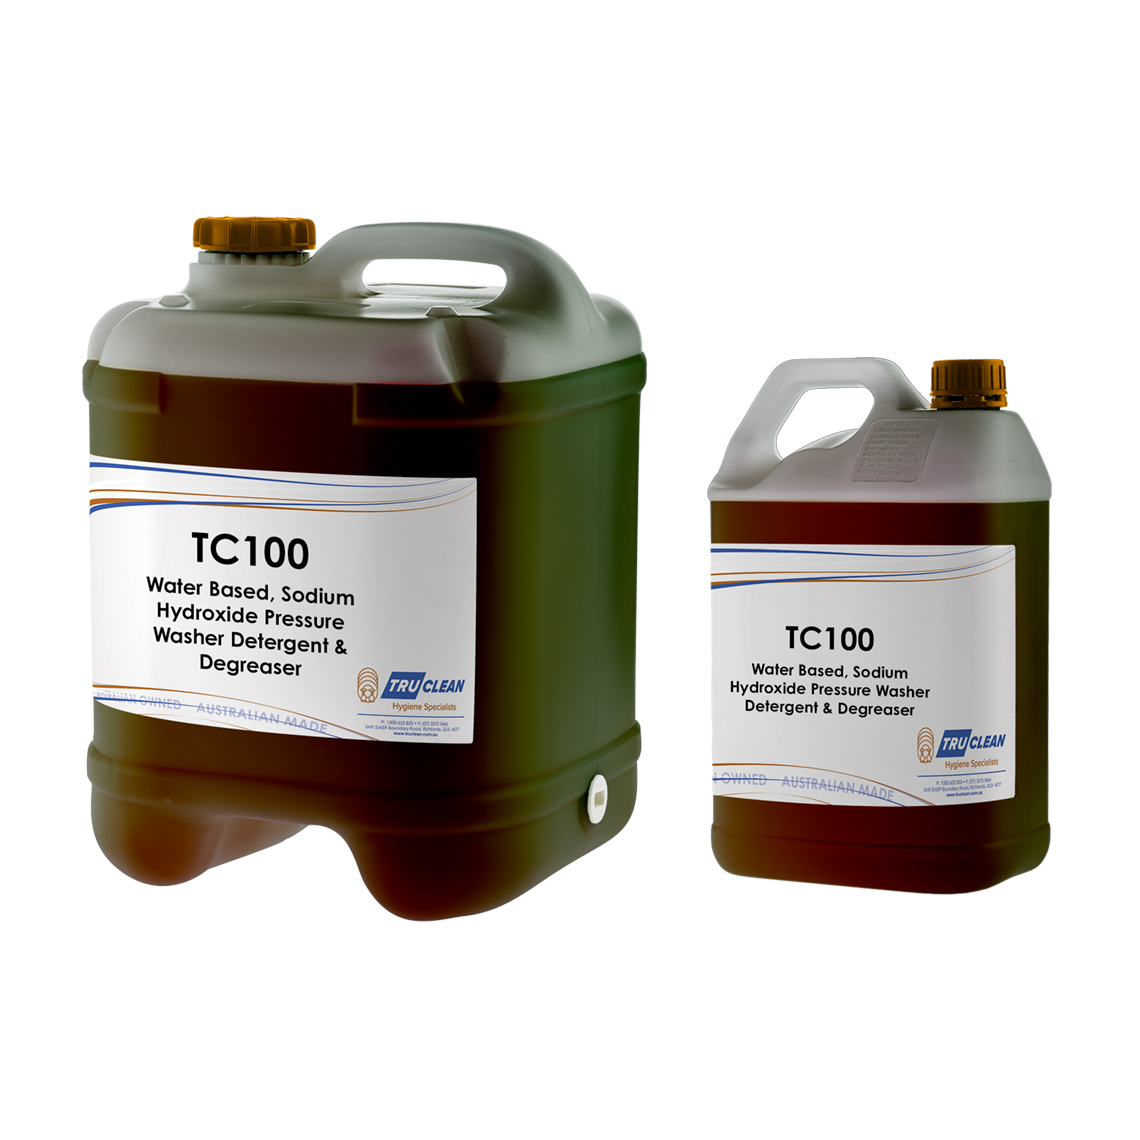 TC100